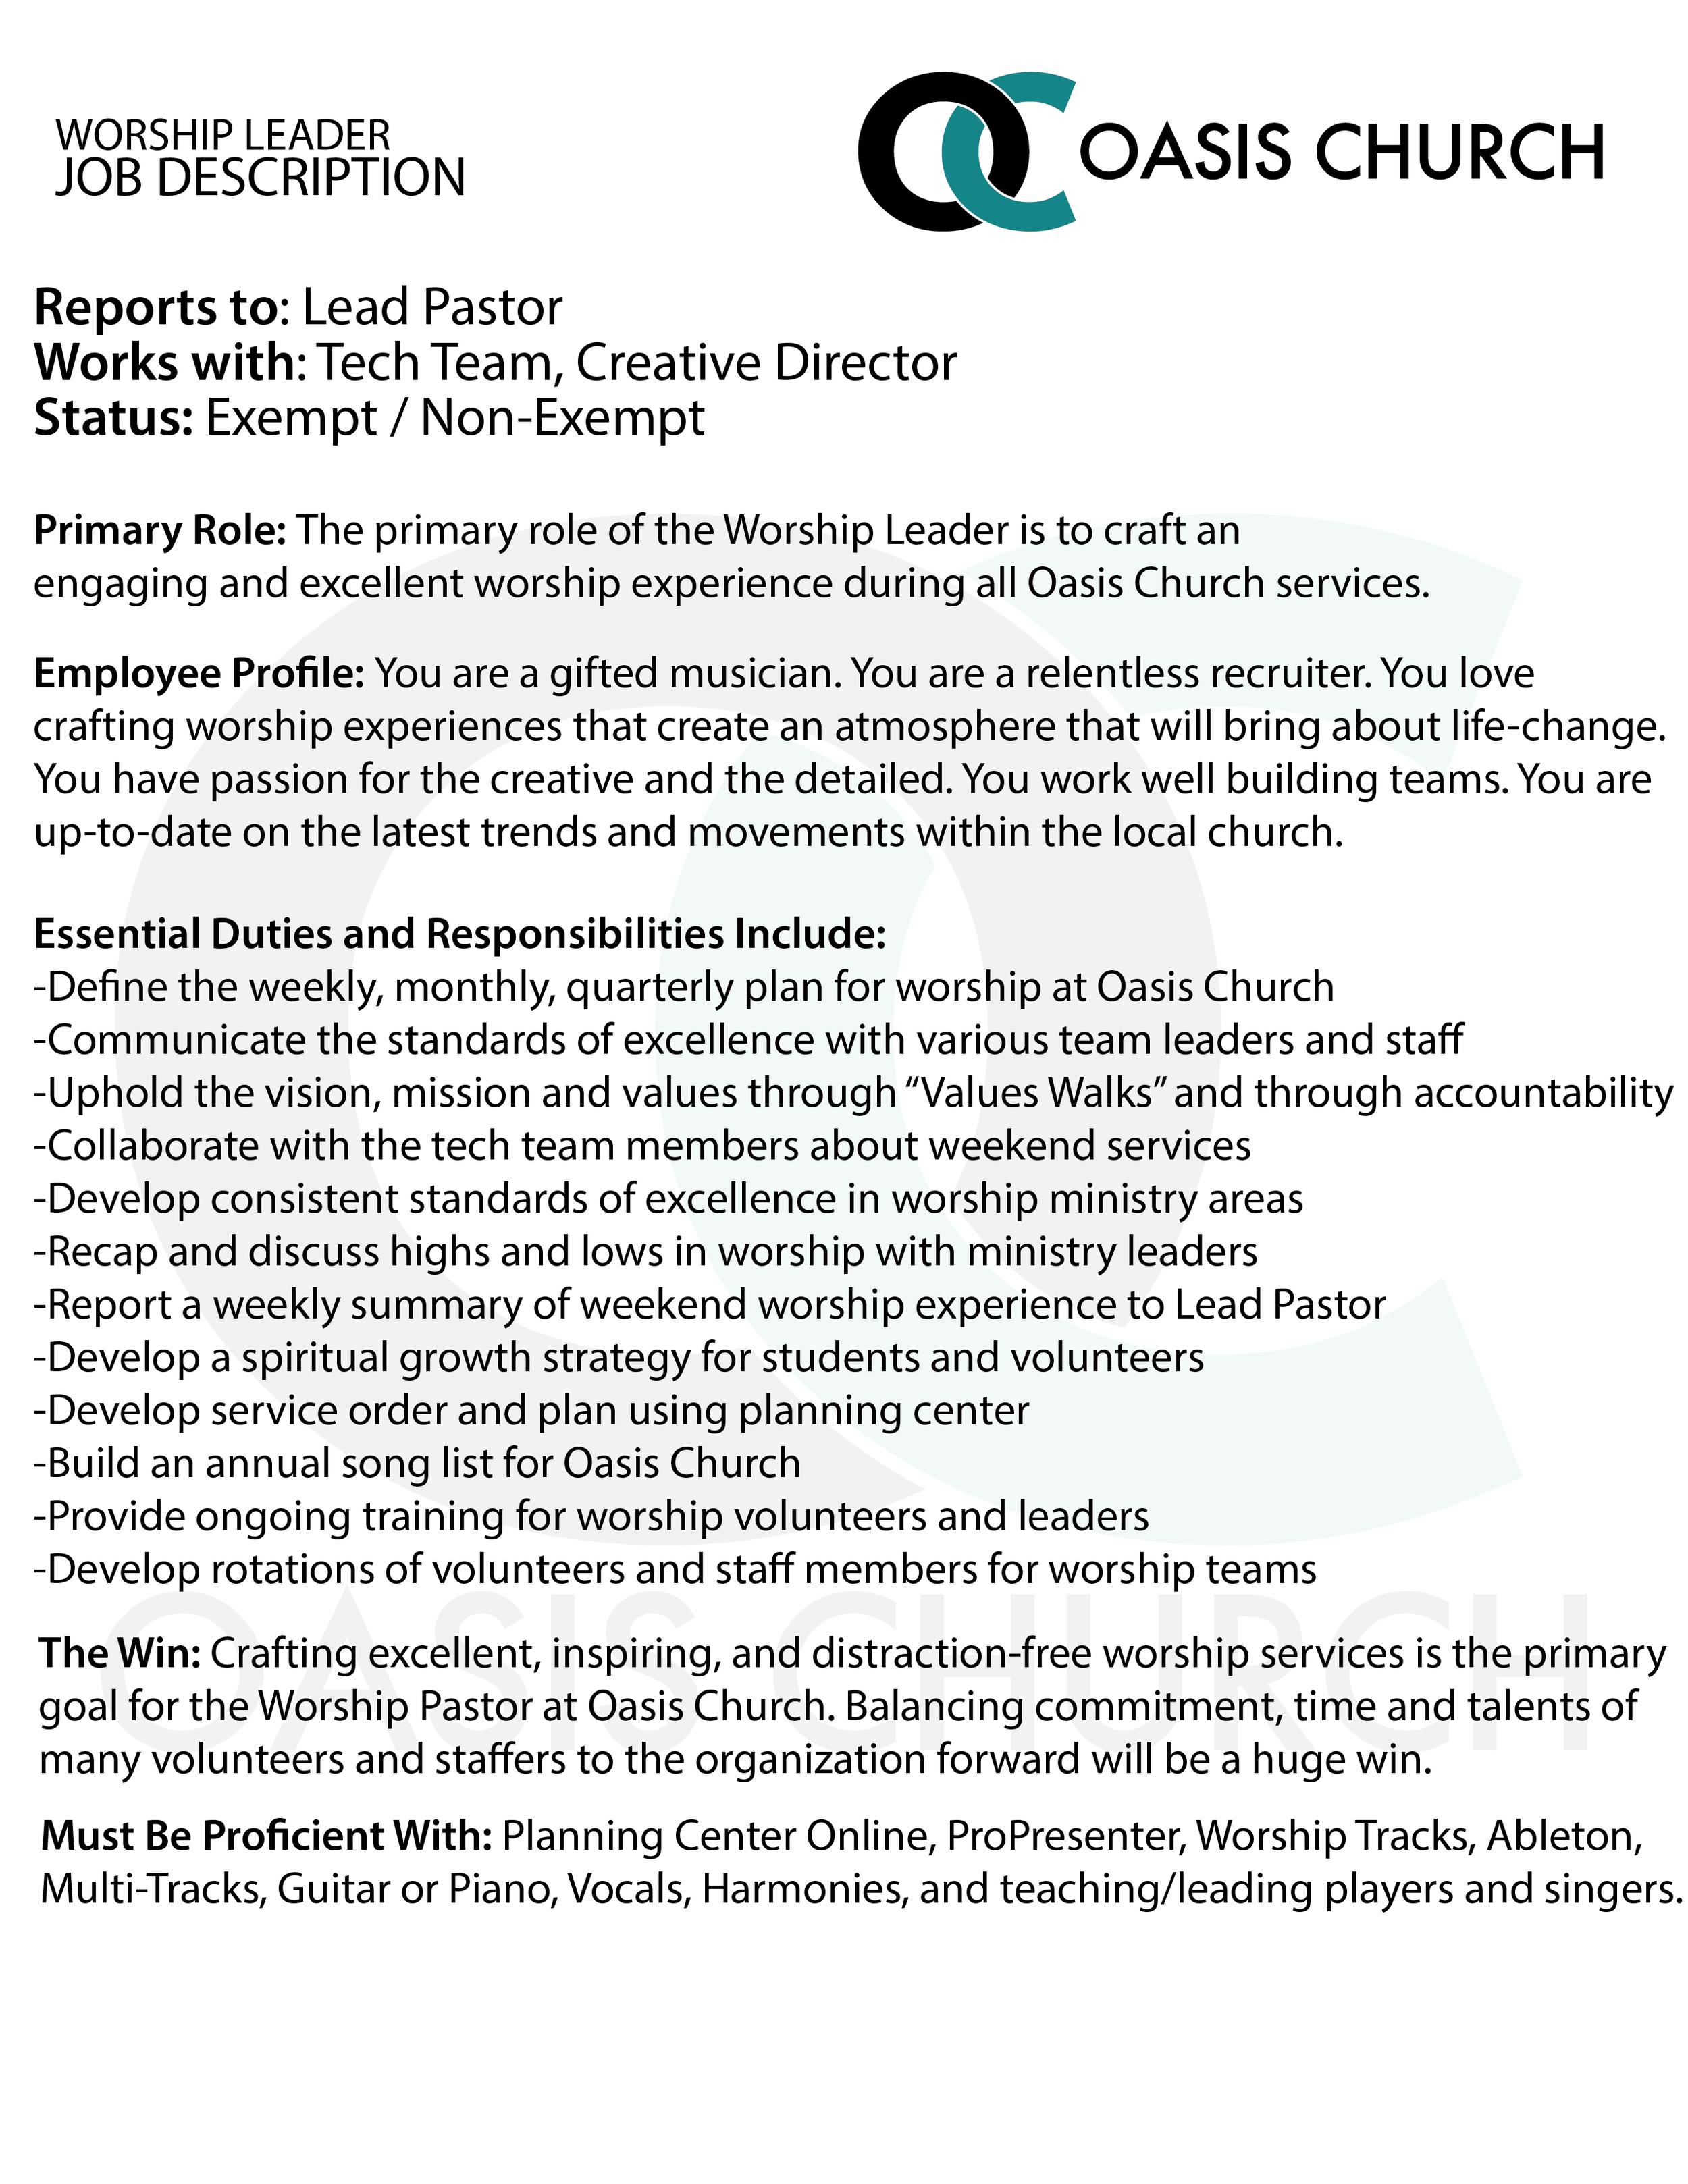 Oasis Church Worship-Student PastorJob Description-01.png